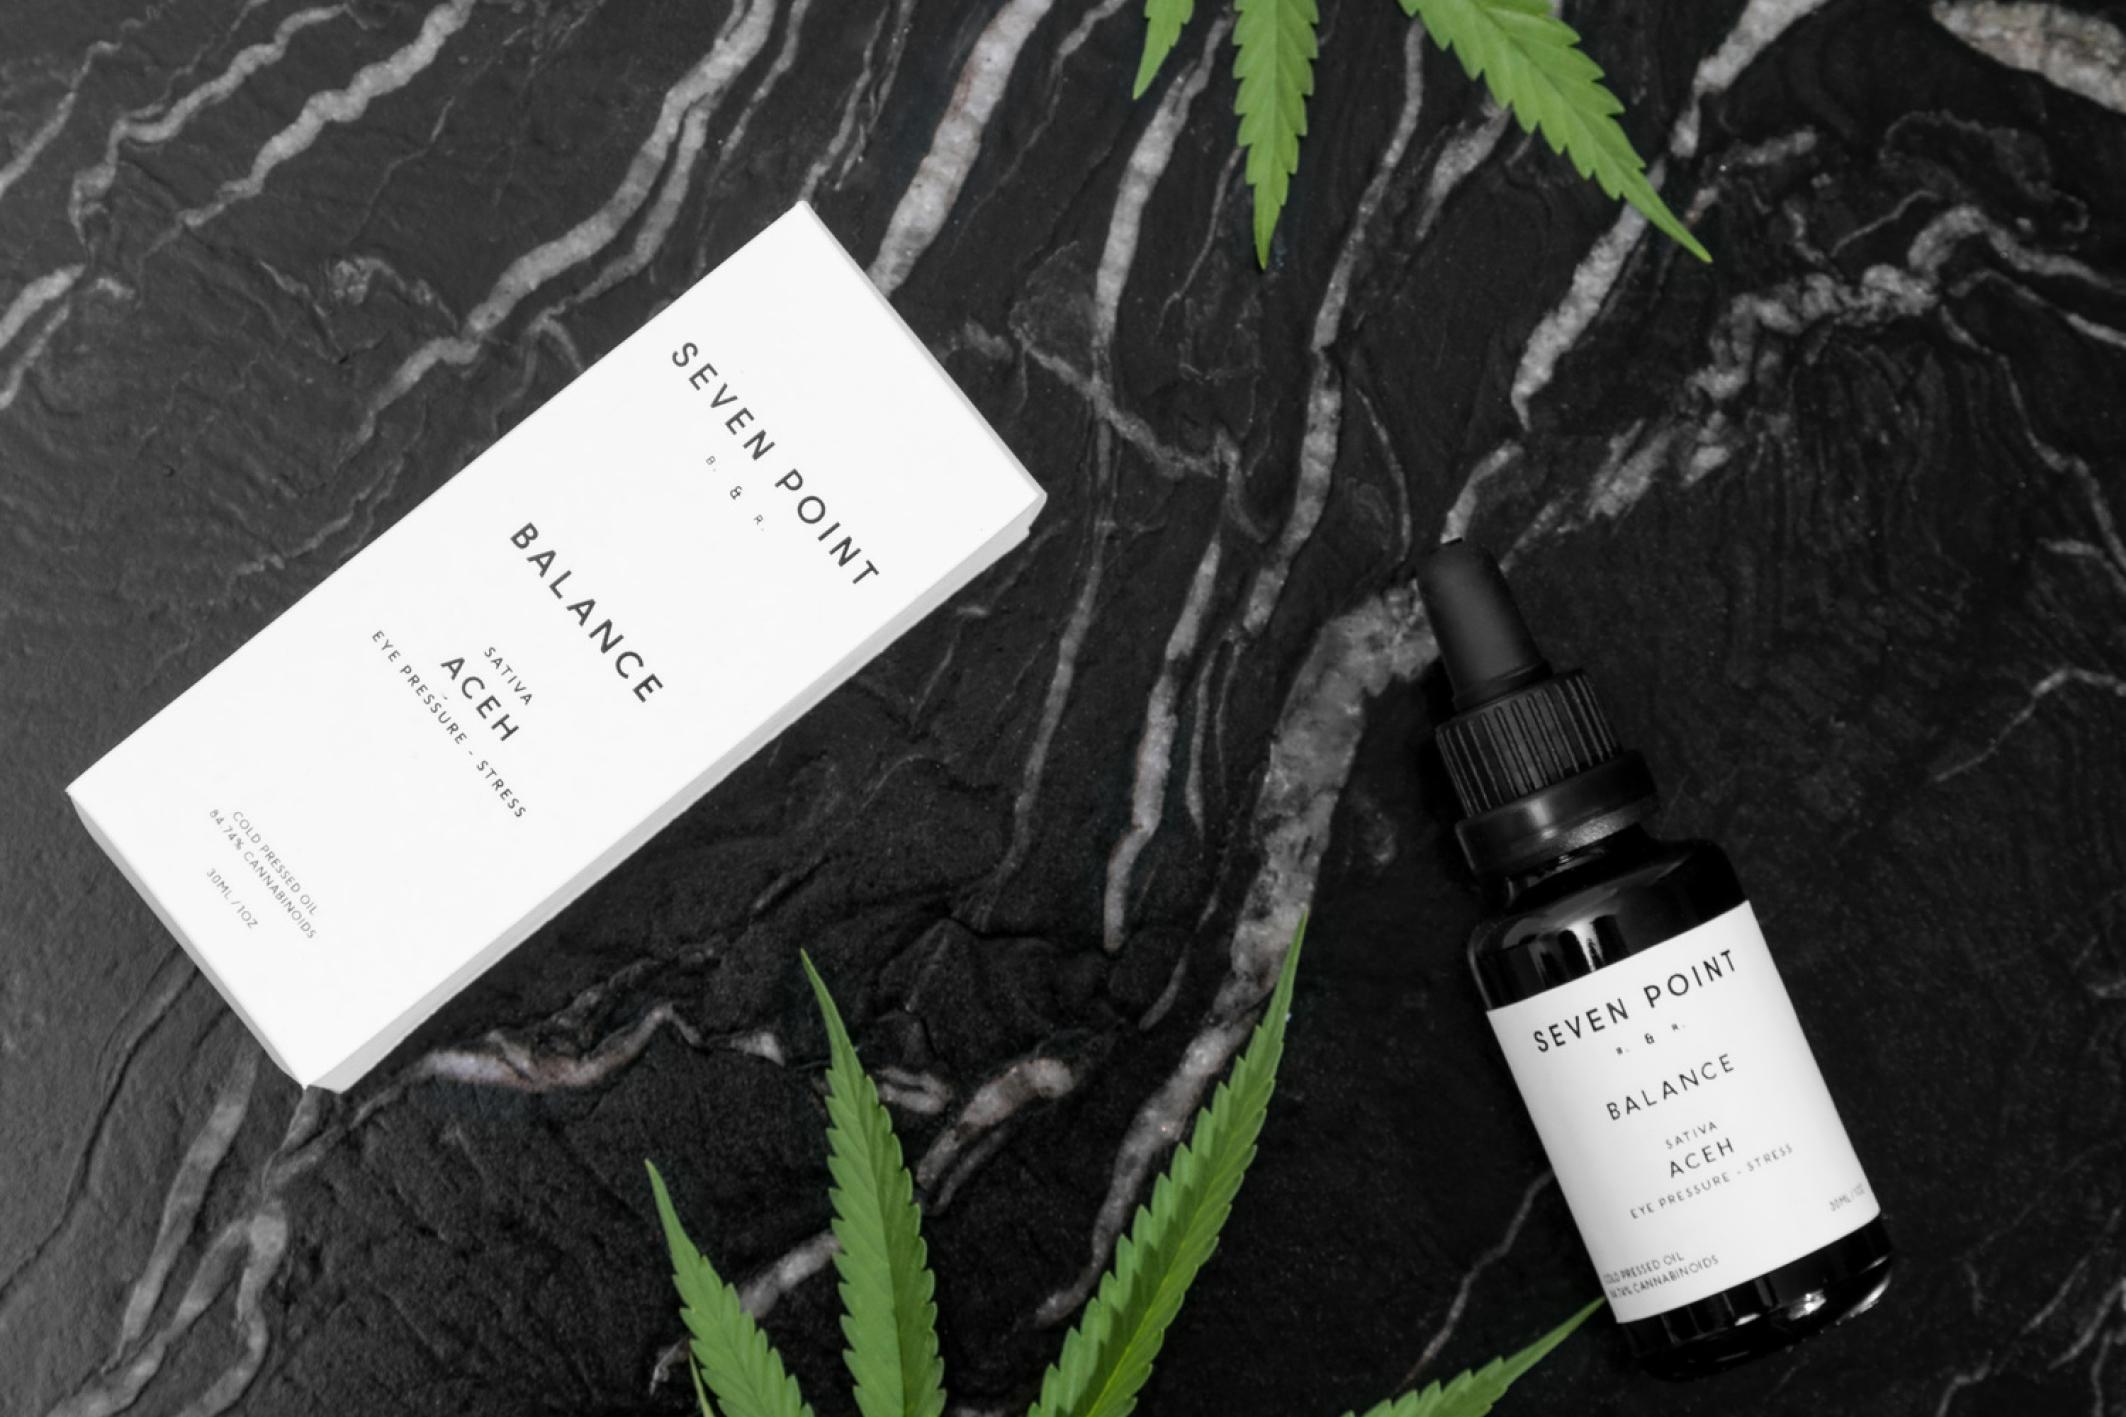 Curioso web_images _layout_Seven Point_cannabis_dispensary_interior_designxx3.jpg